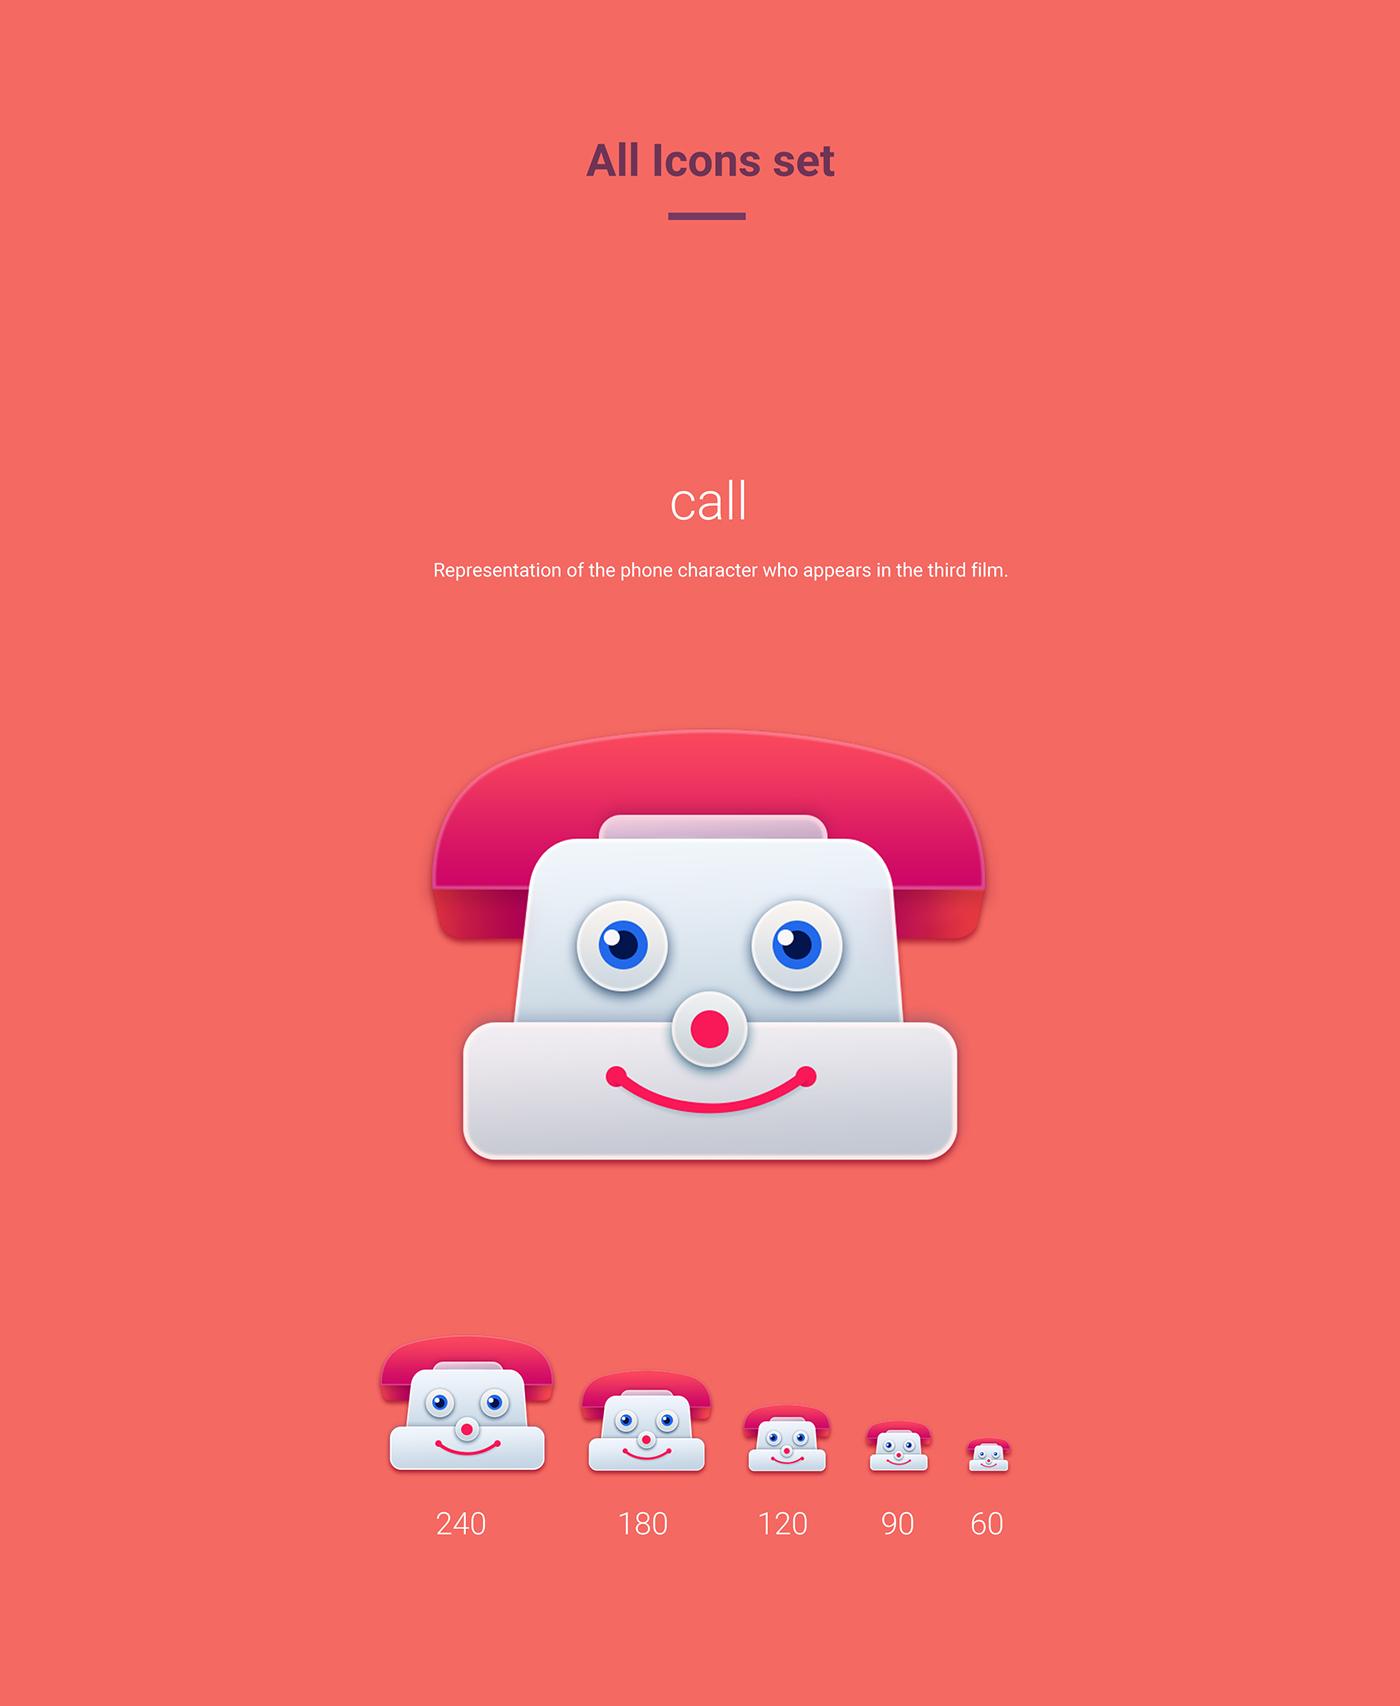 disney-pixar-toy-story-android-icons-leo-natsume-01